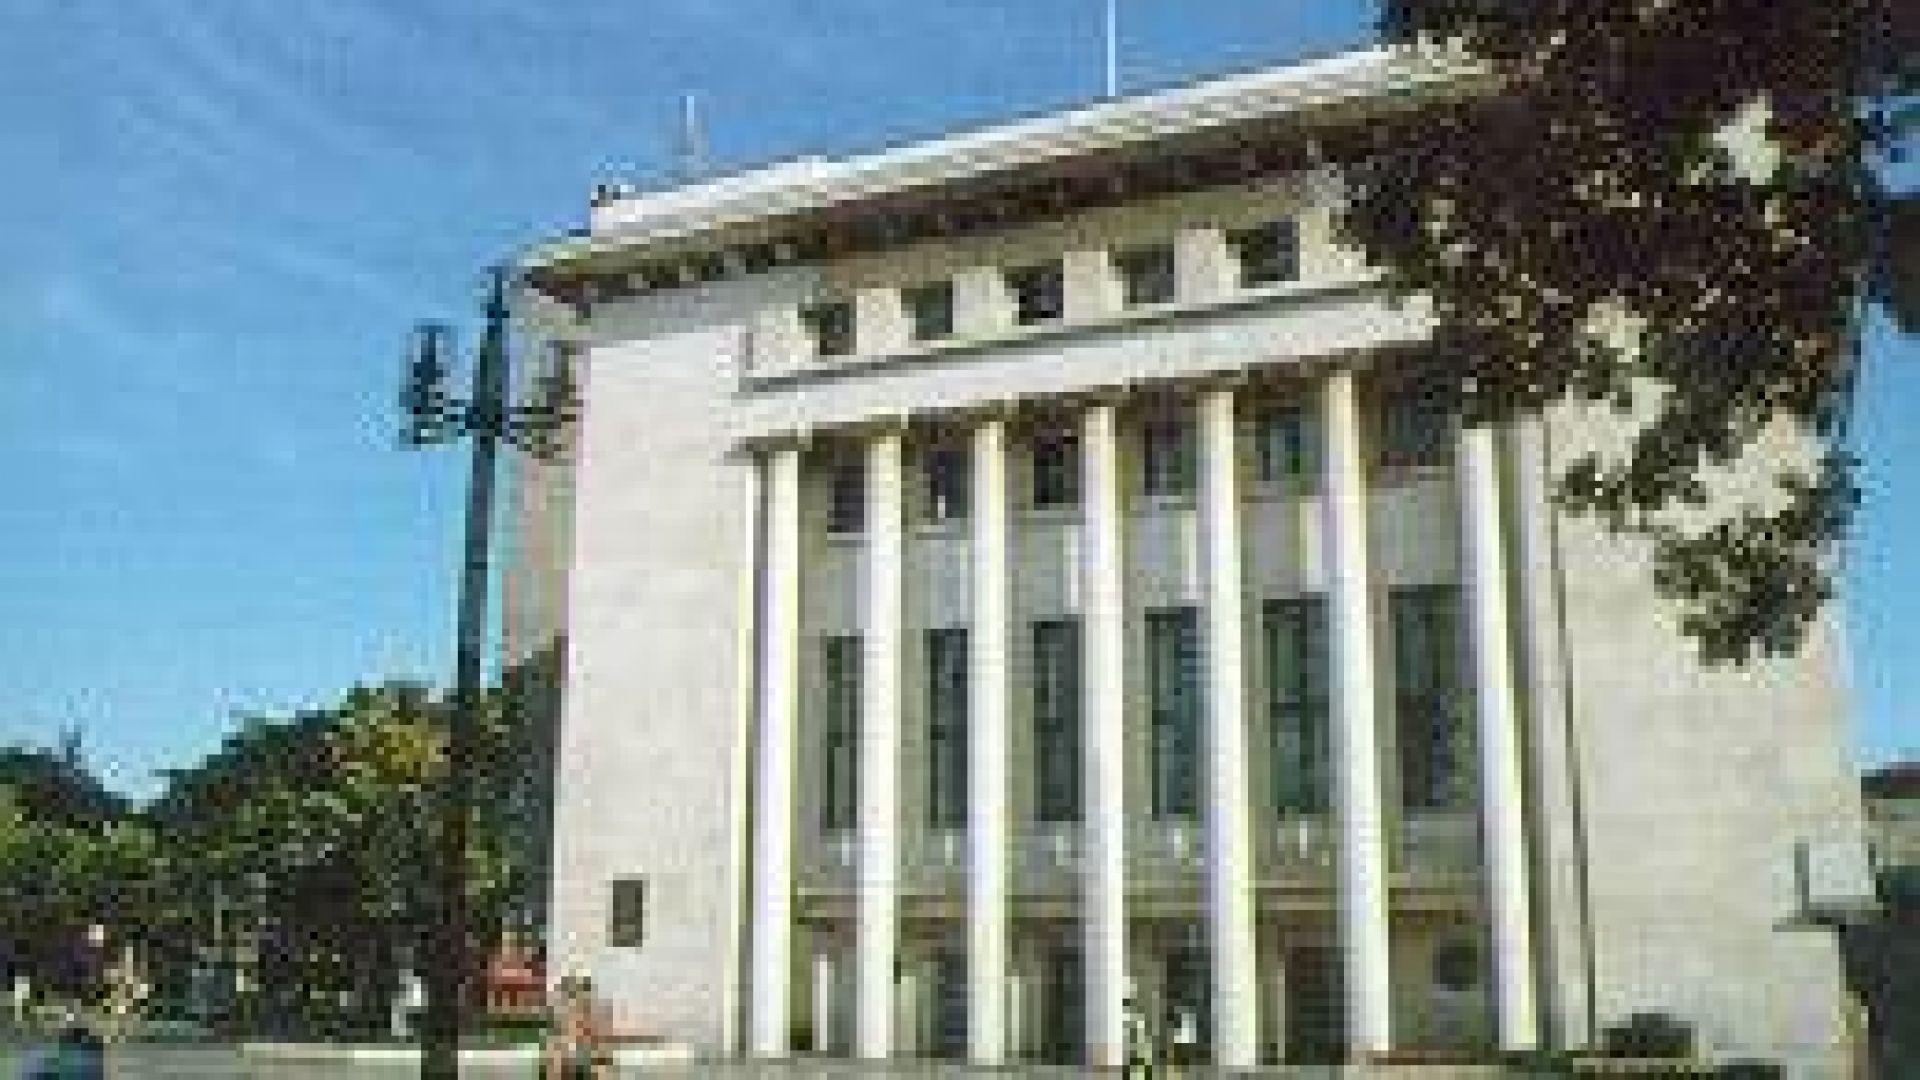 30 нови работни места разкрива община Бургас